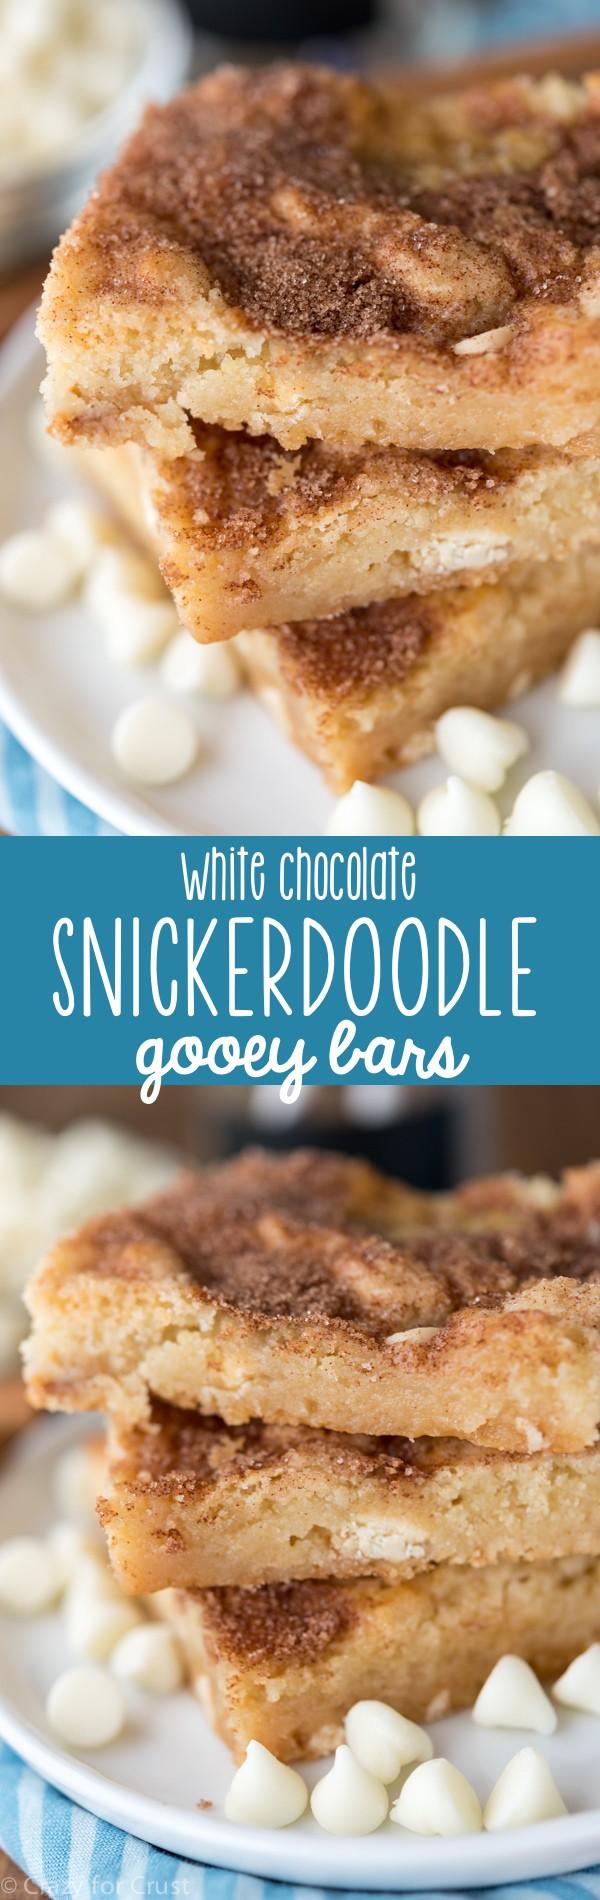 White Chocolate Snickerdoodle Gooey Bars